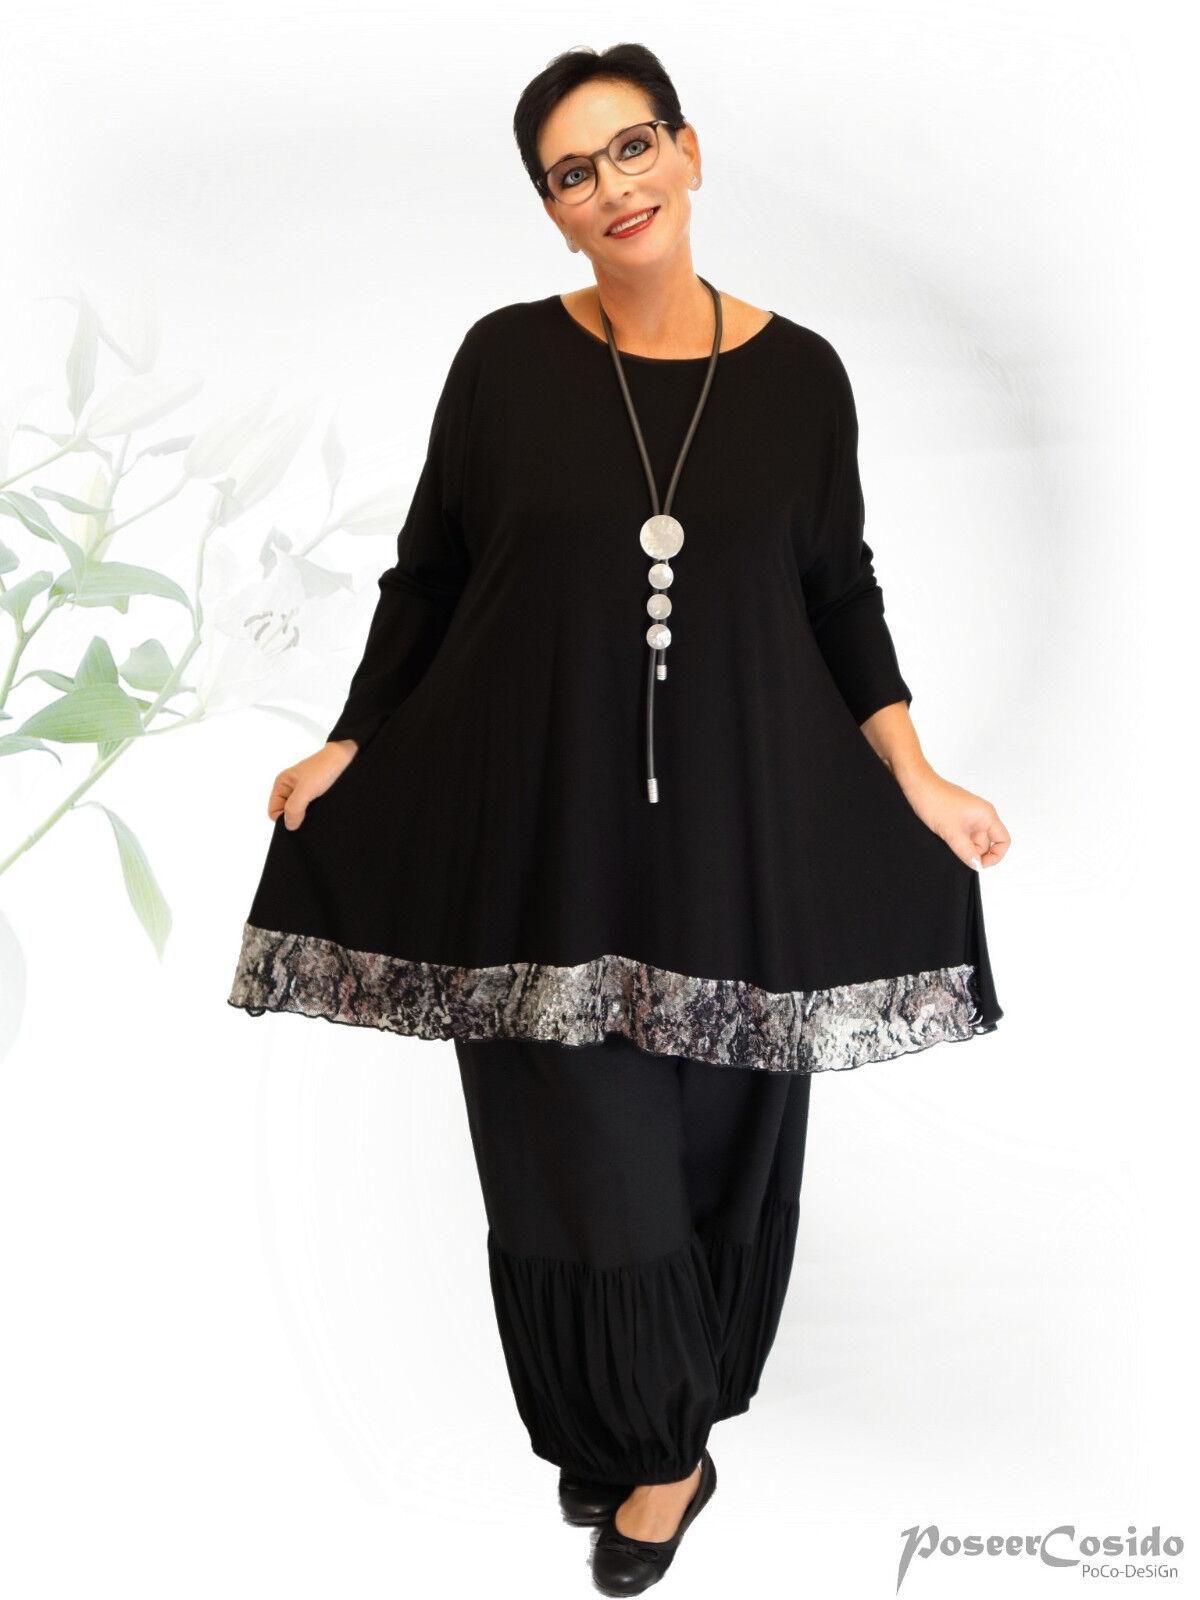 PoCo DeSiGn° LAGENLOOK Tunika Long-Shirt Spitzen-Saum schwarz L-XL-XXL-XXXL